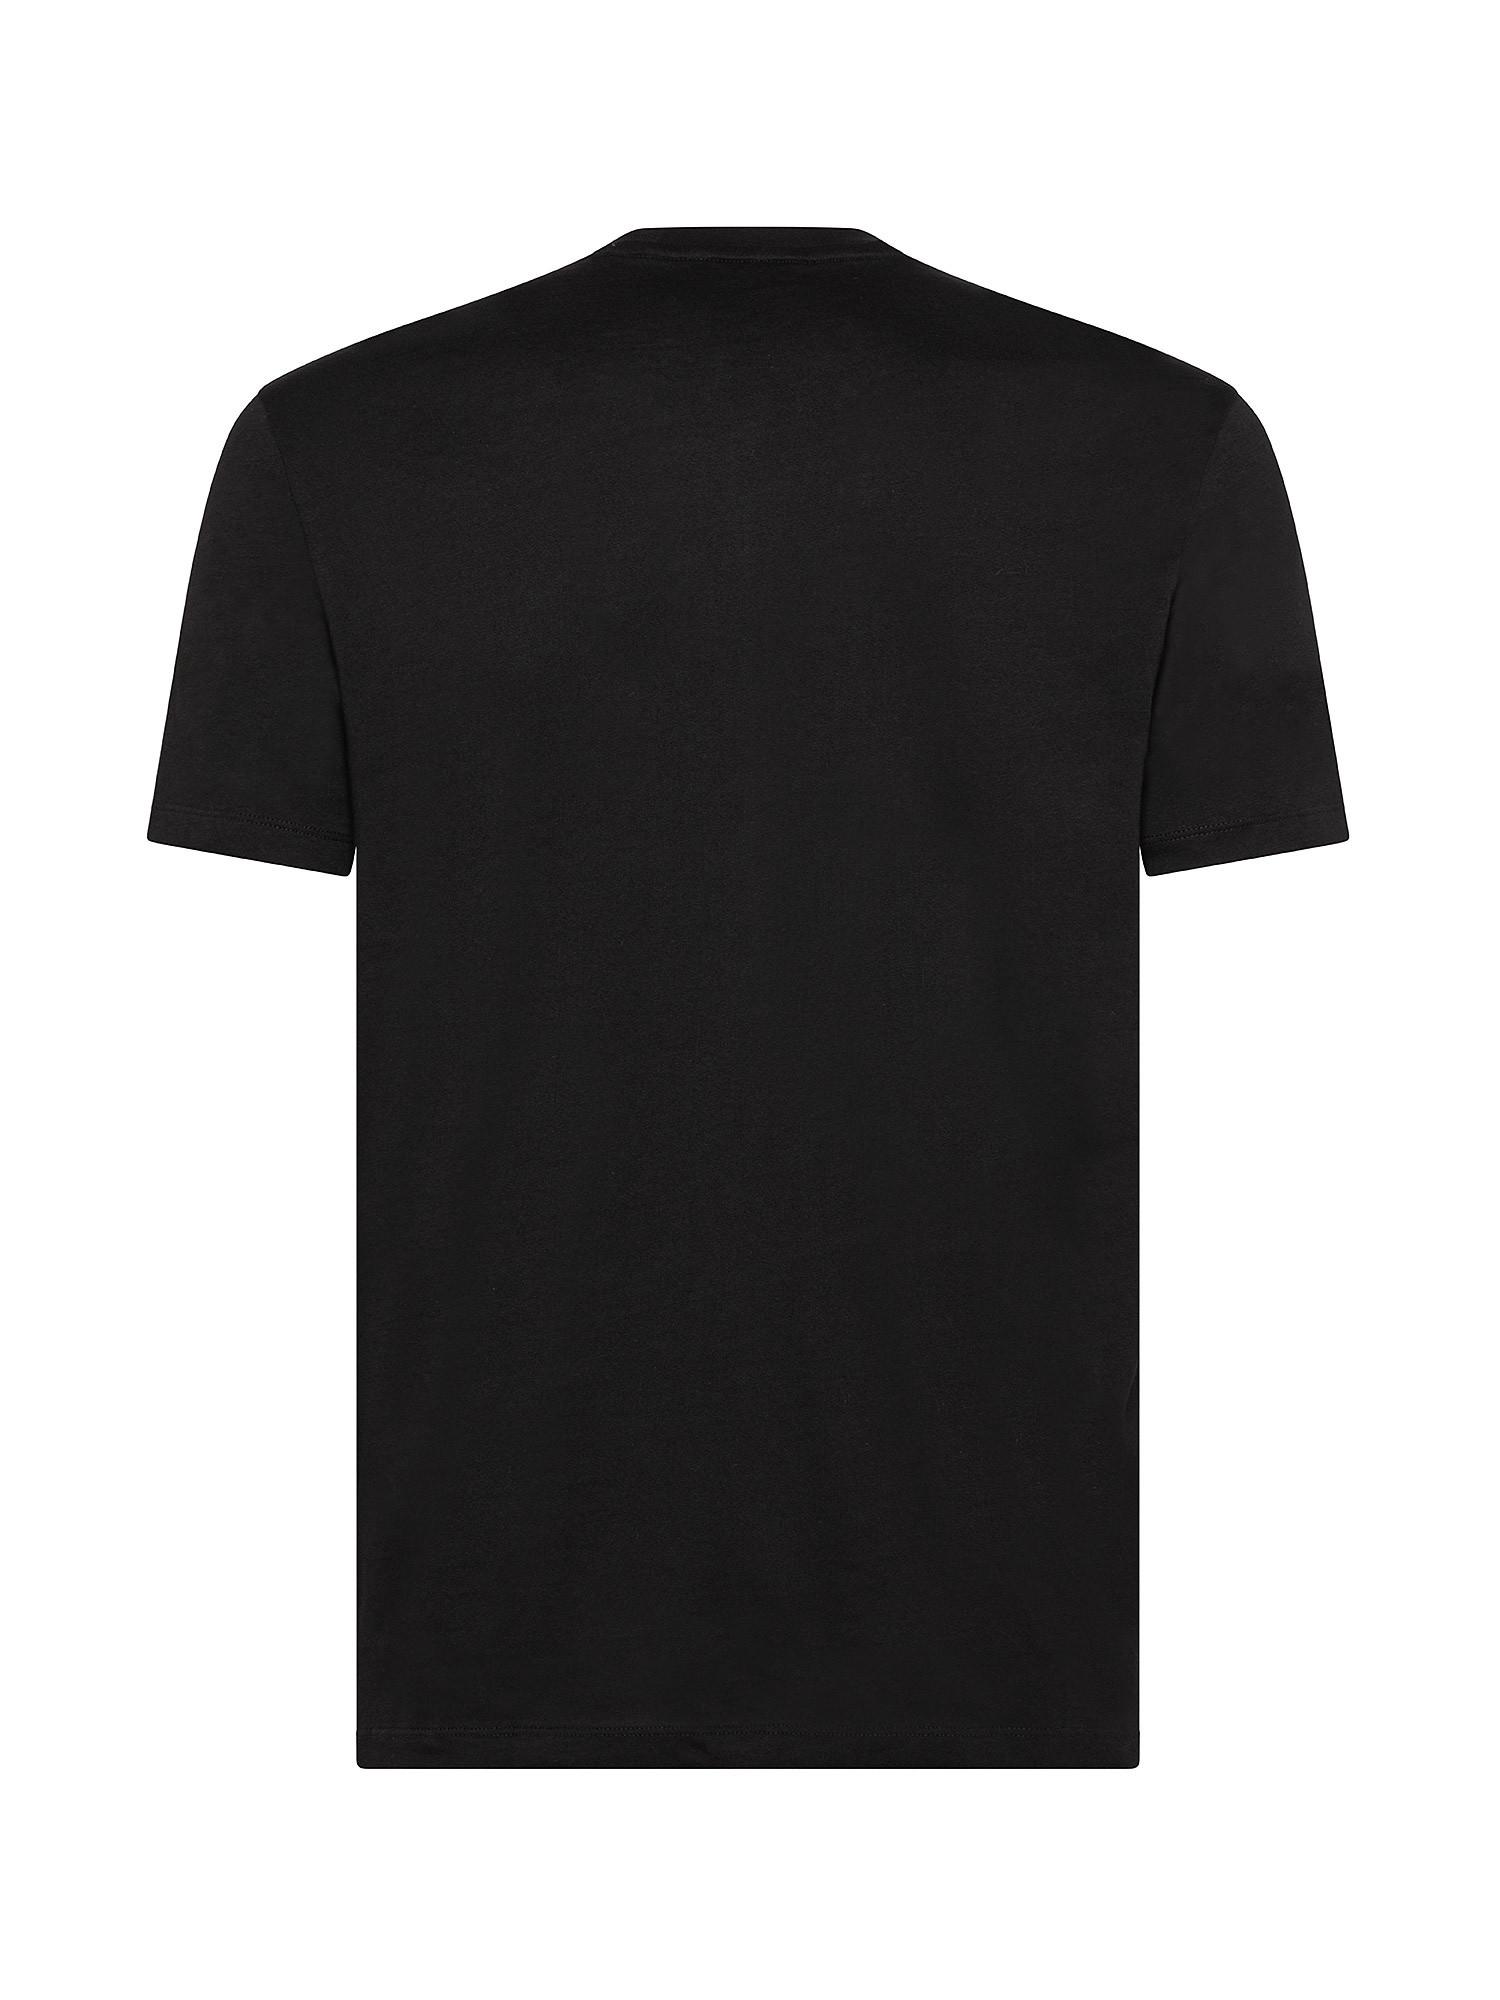 T-Shirt, Nero, large image number 1